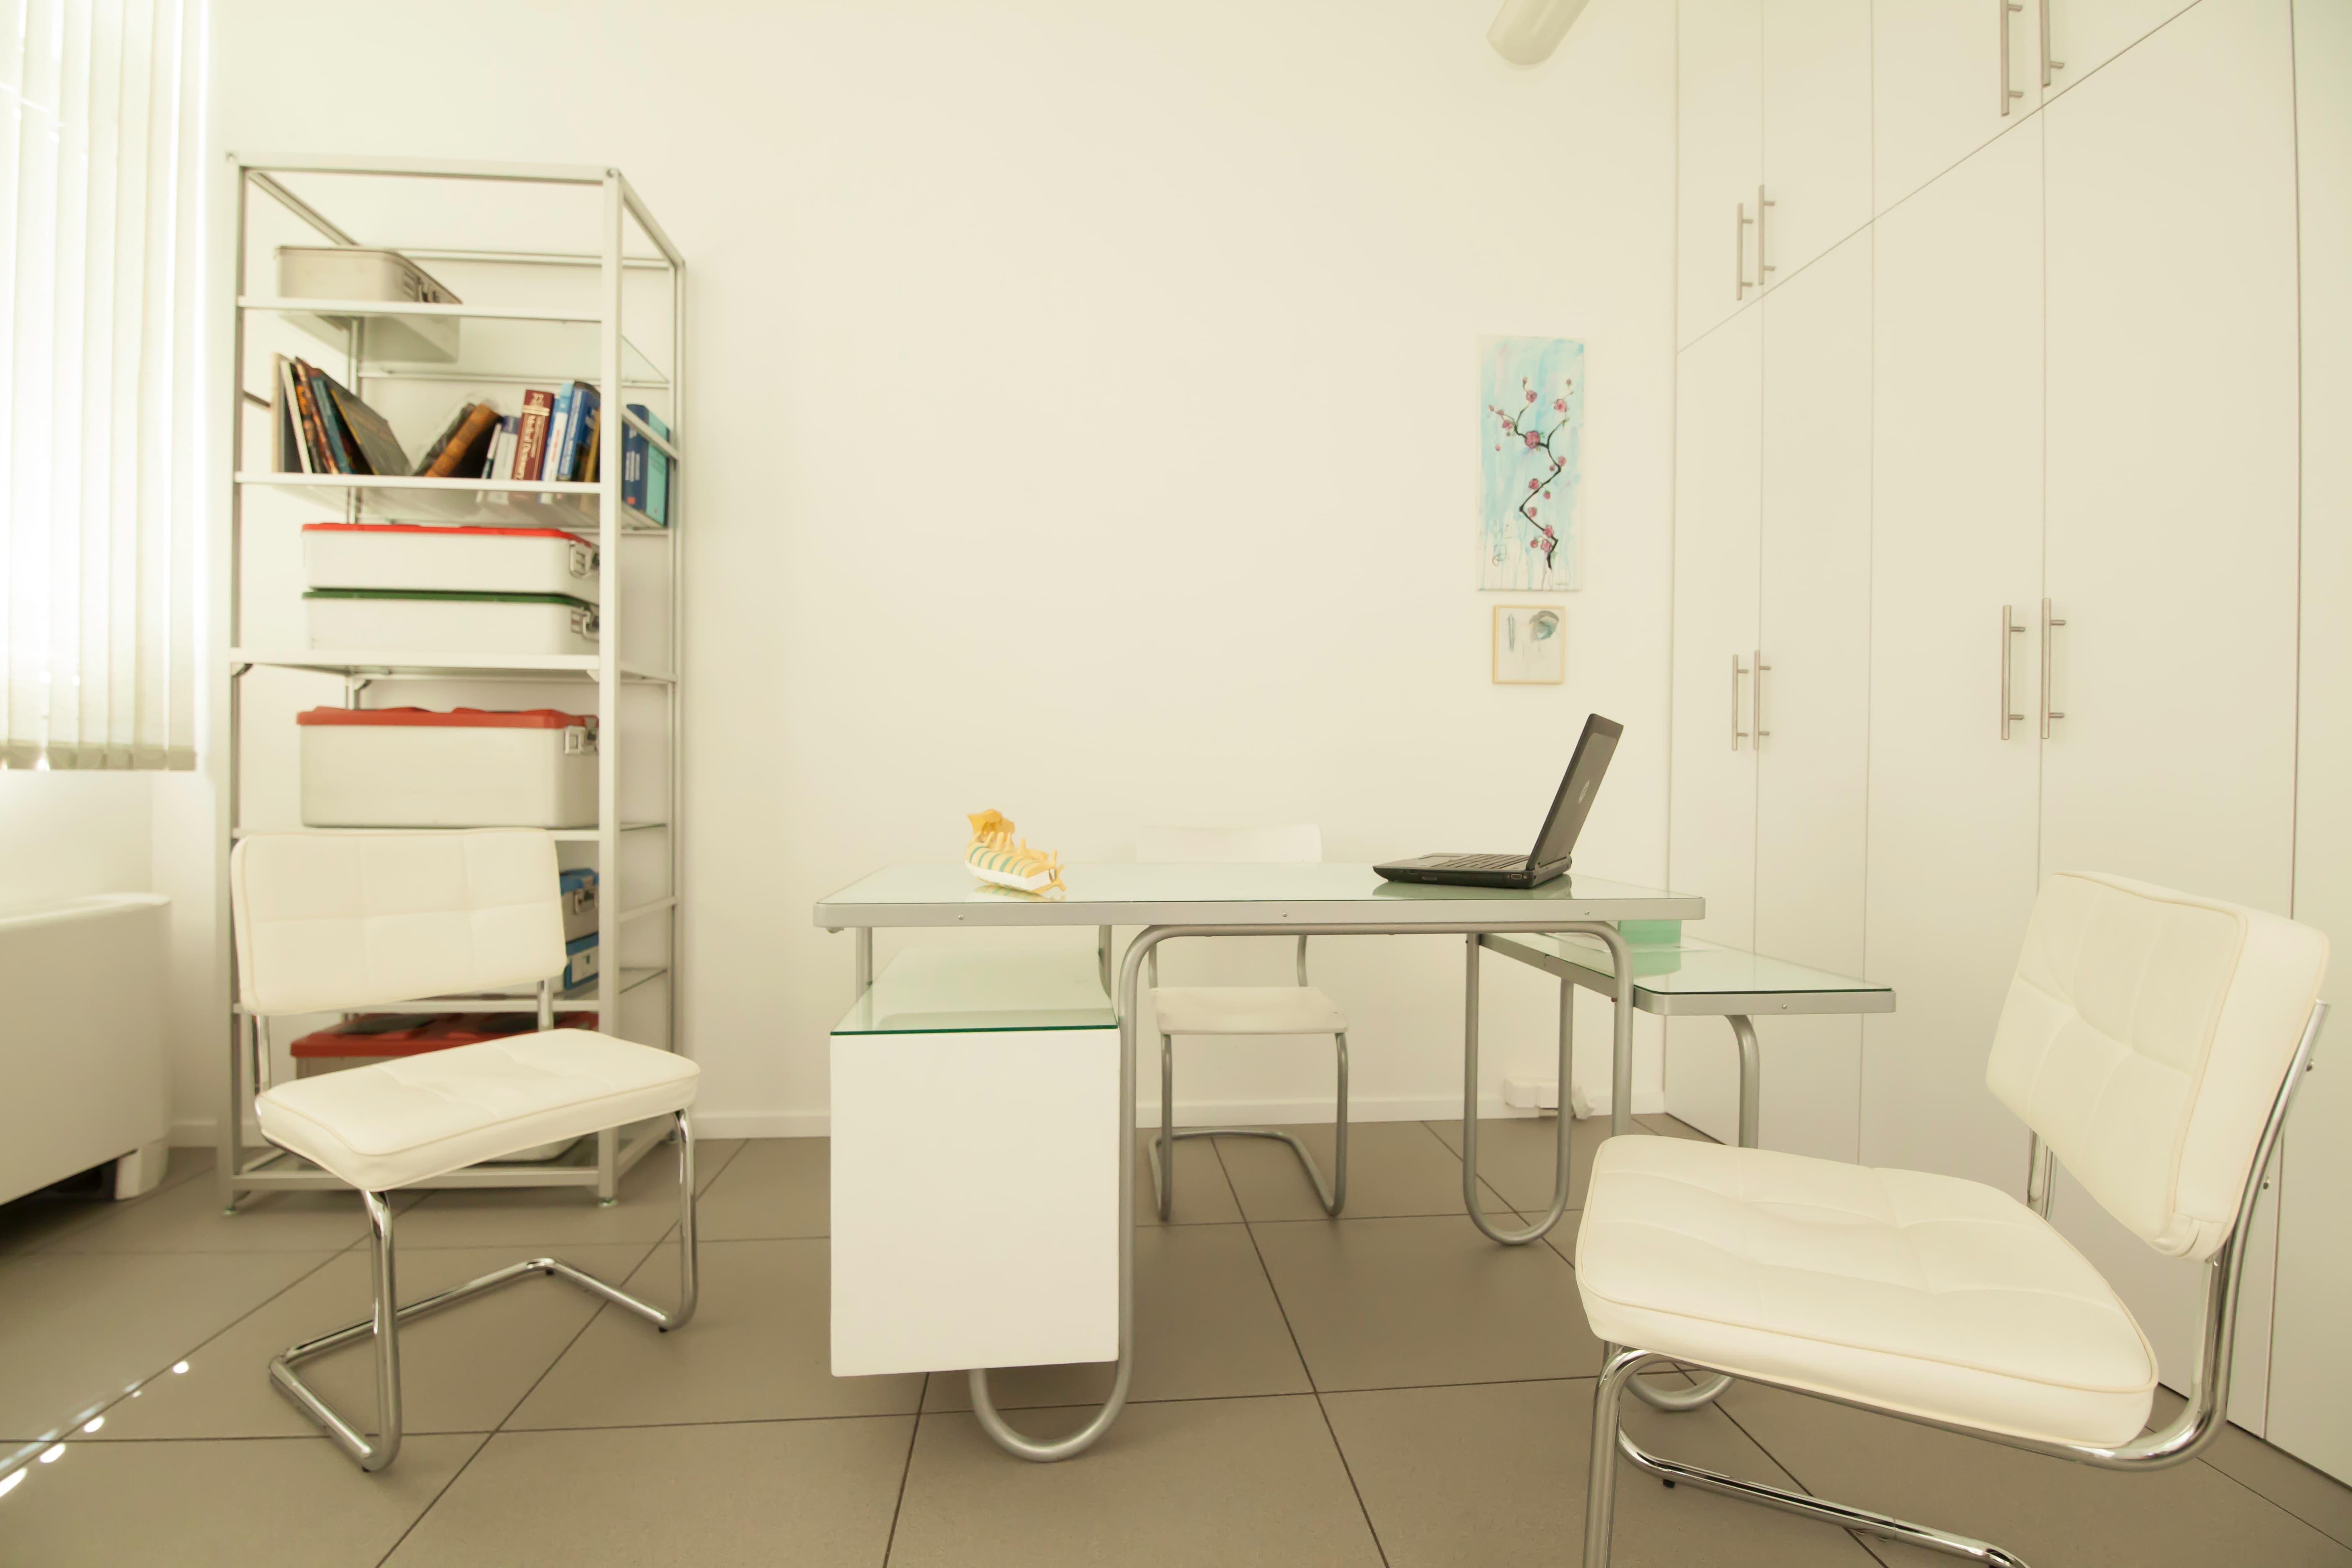 medicinski-centar-sveta-troitsa-snimka-07